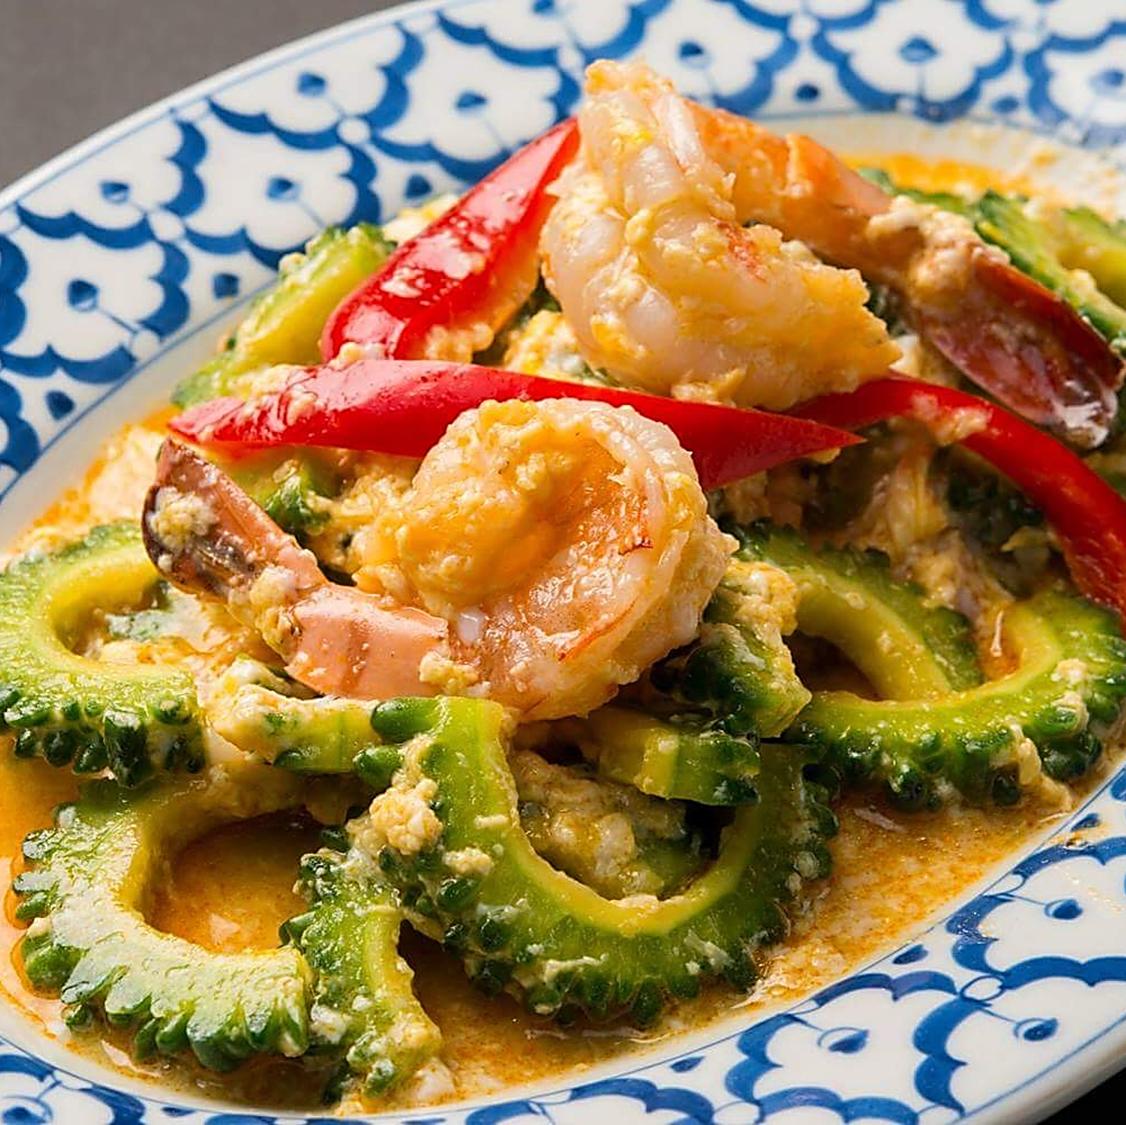 Stir-fry shrimp and bitter gourd